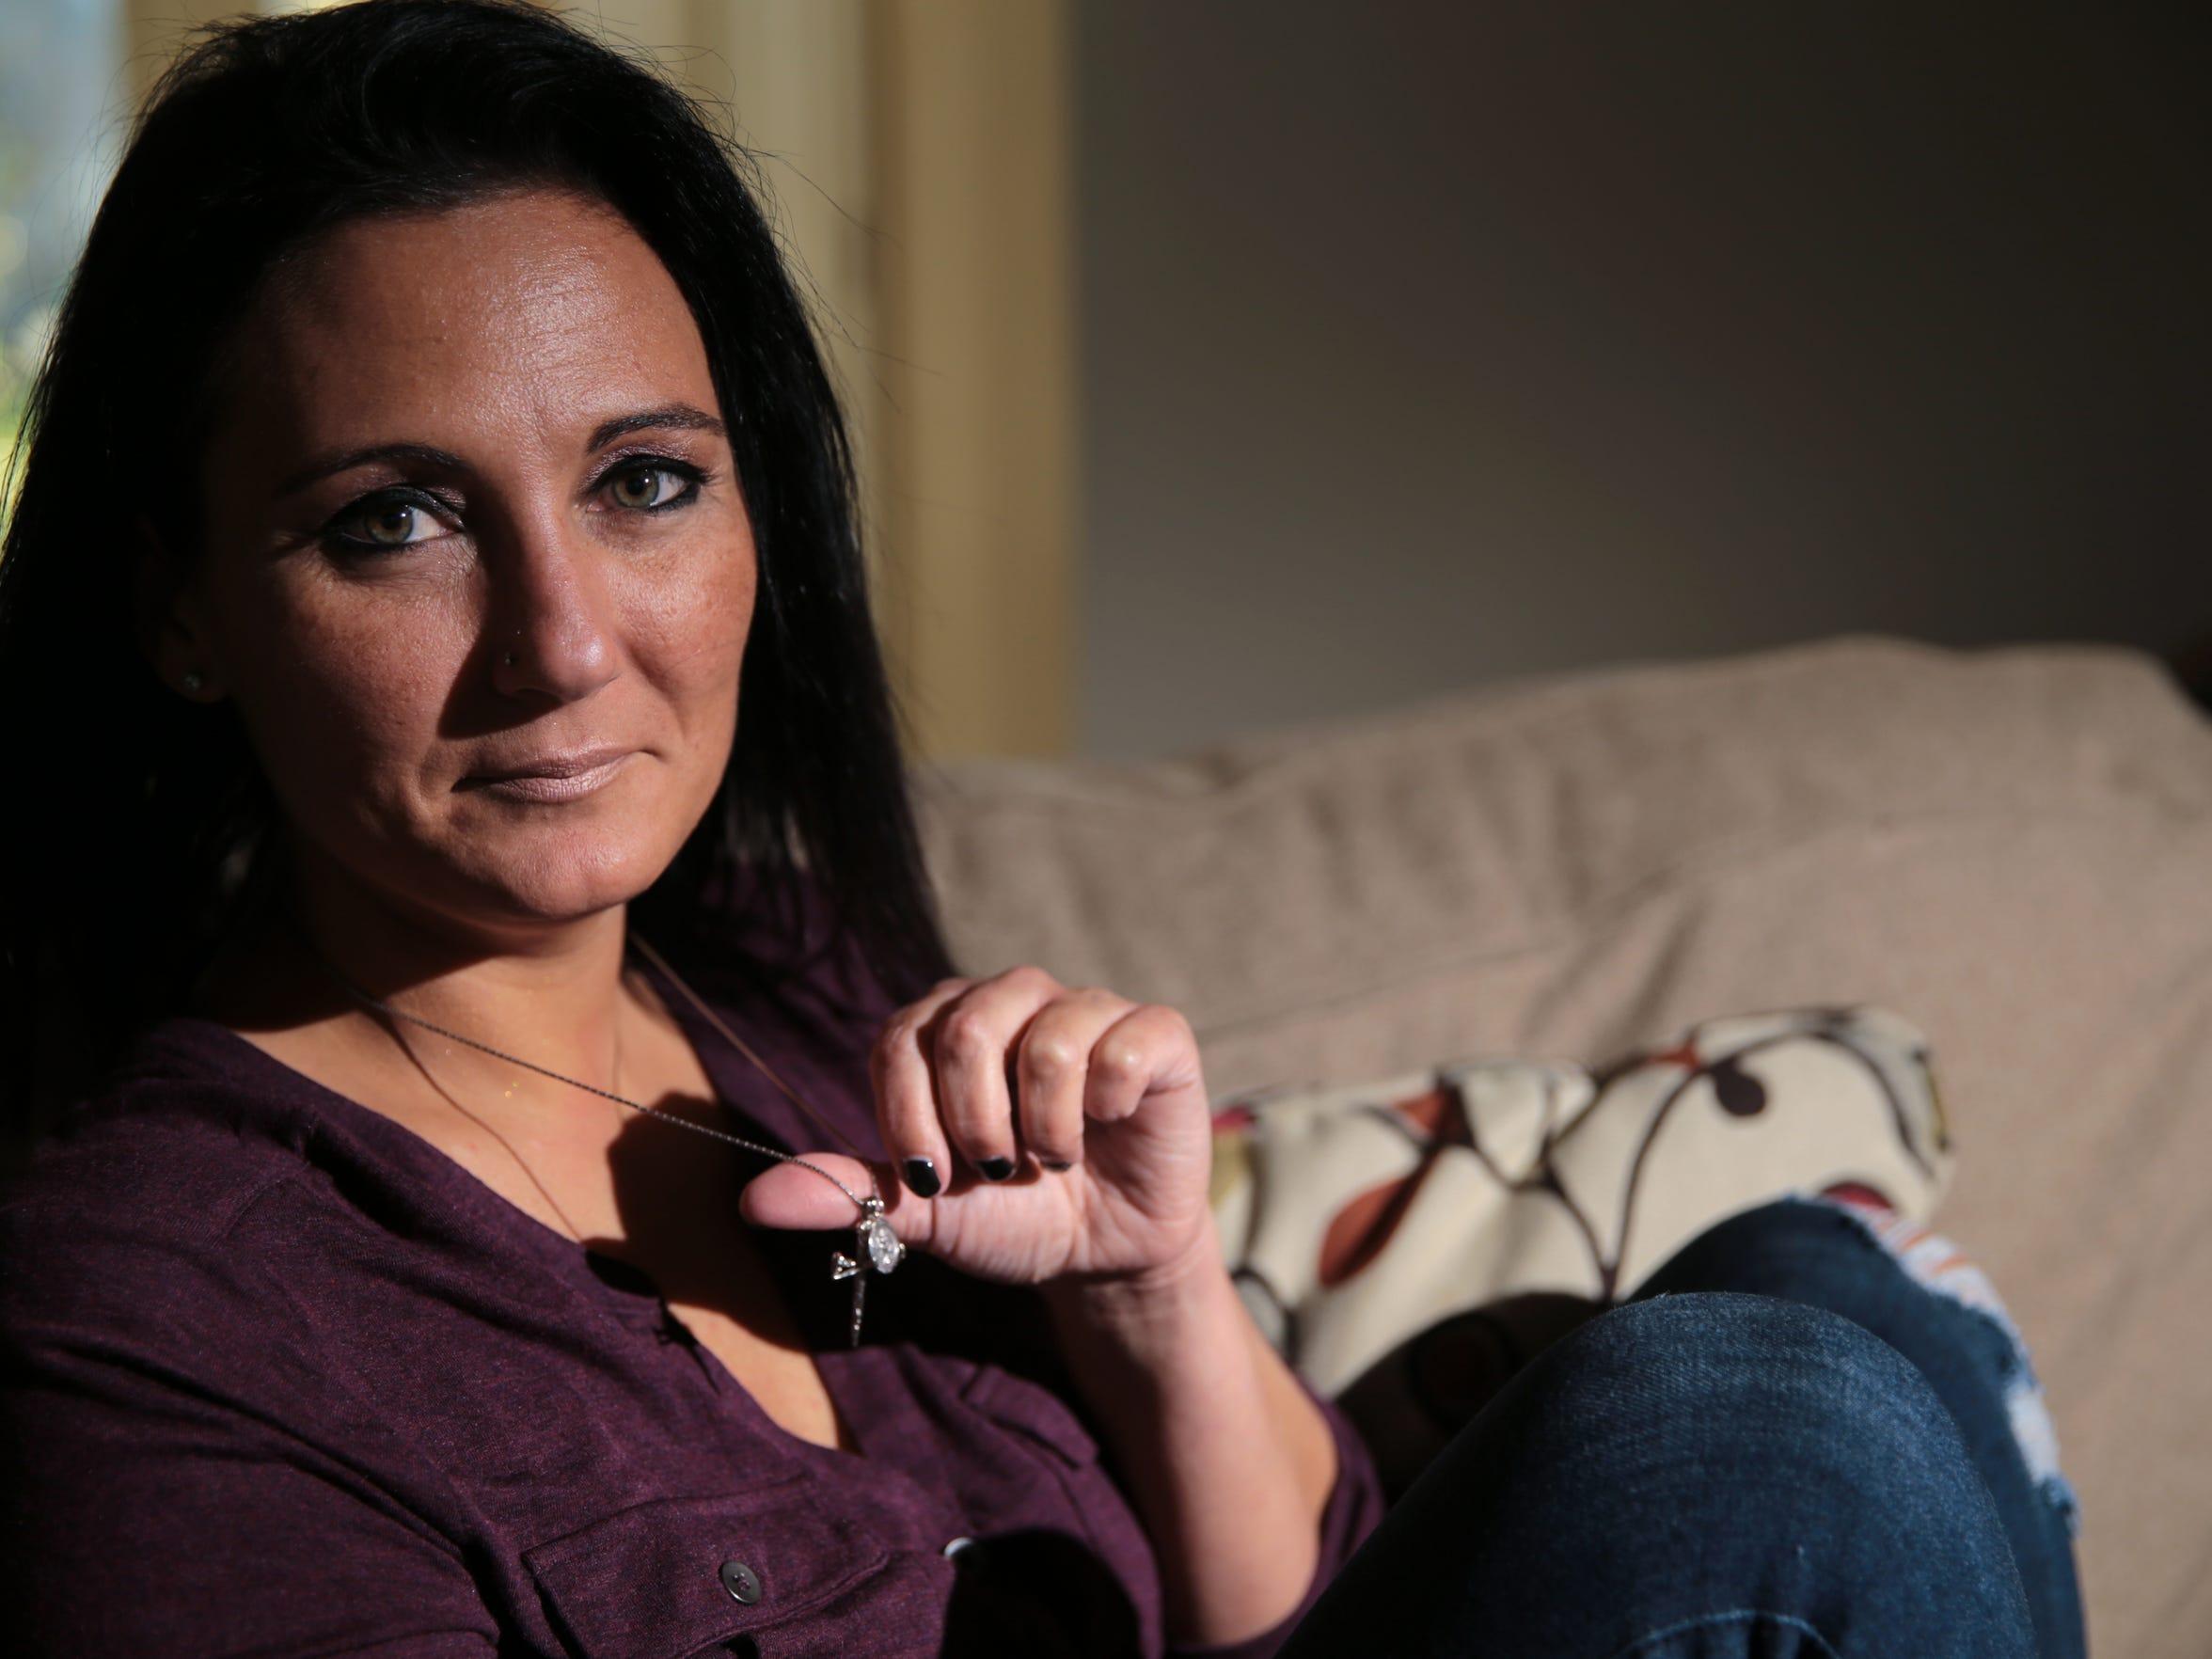 Christine Shamoon, Jacob Faulkner's girlfriend, holds